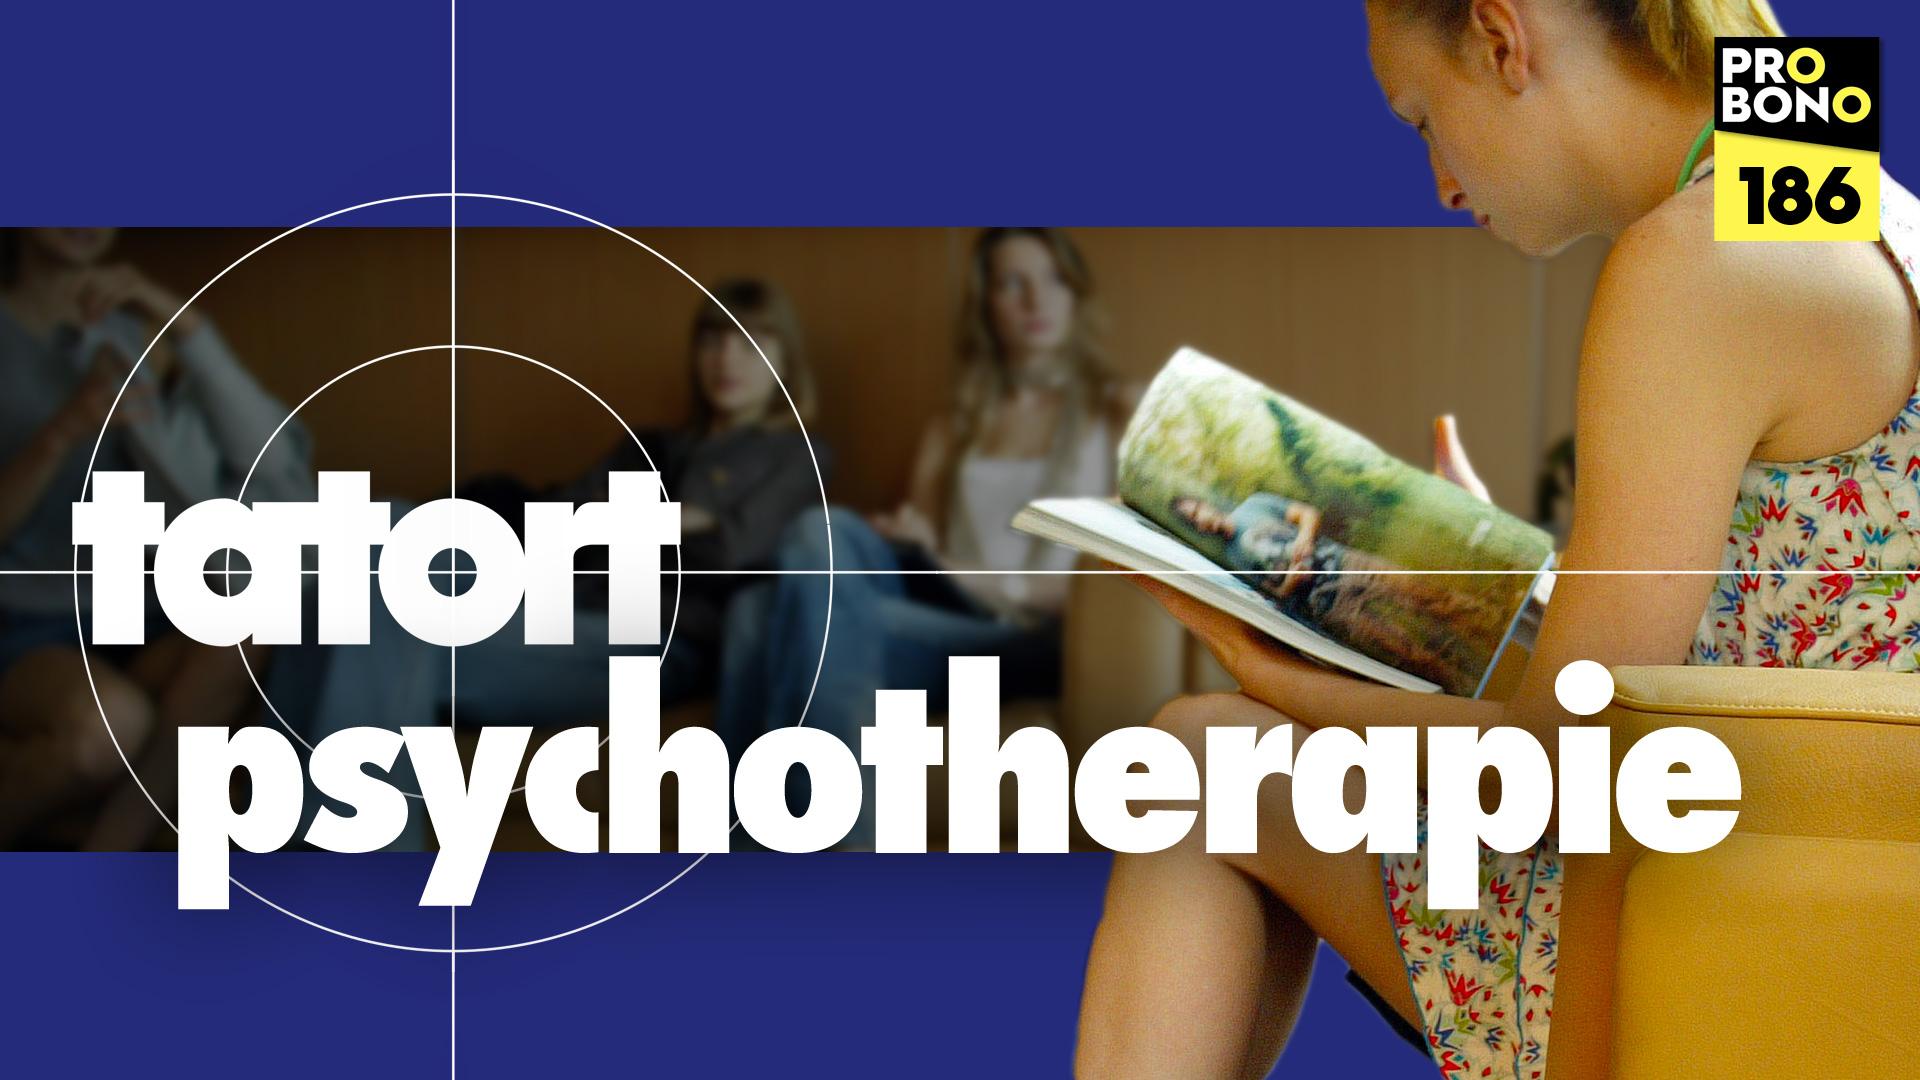 Tatort Psychotherapie (probono Magazin)